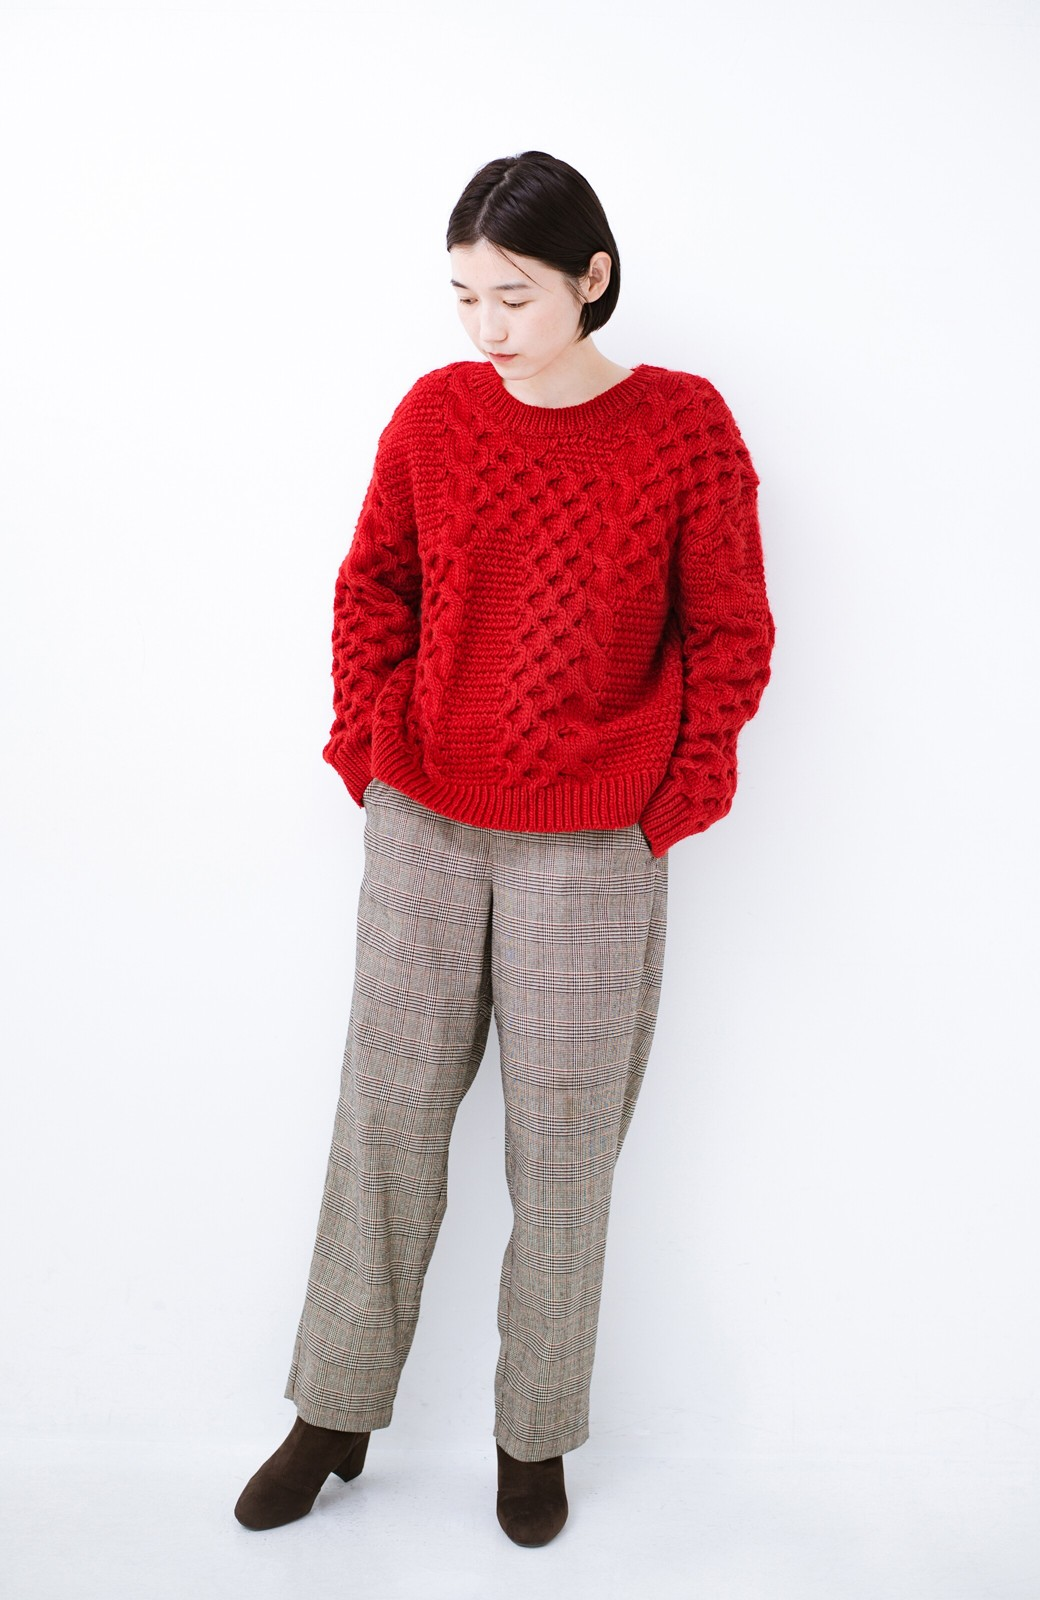 haco! 古着っぽい雰囲気がこなれたパネル編みケーブルニット <レッド>の商品写真7